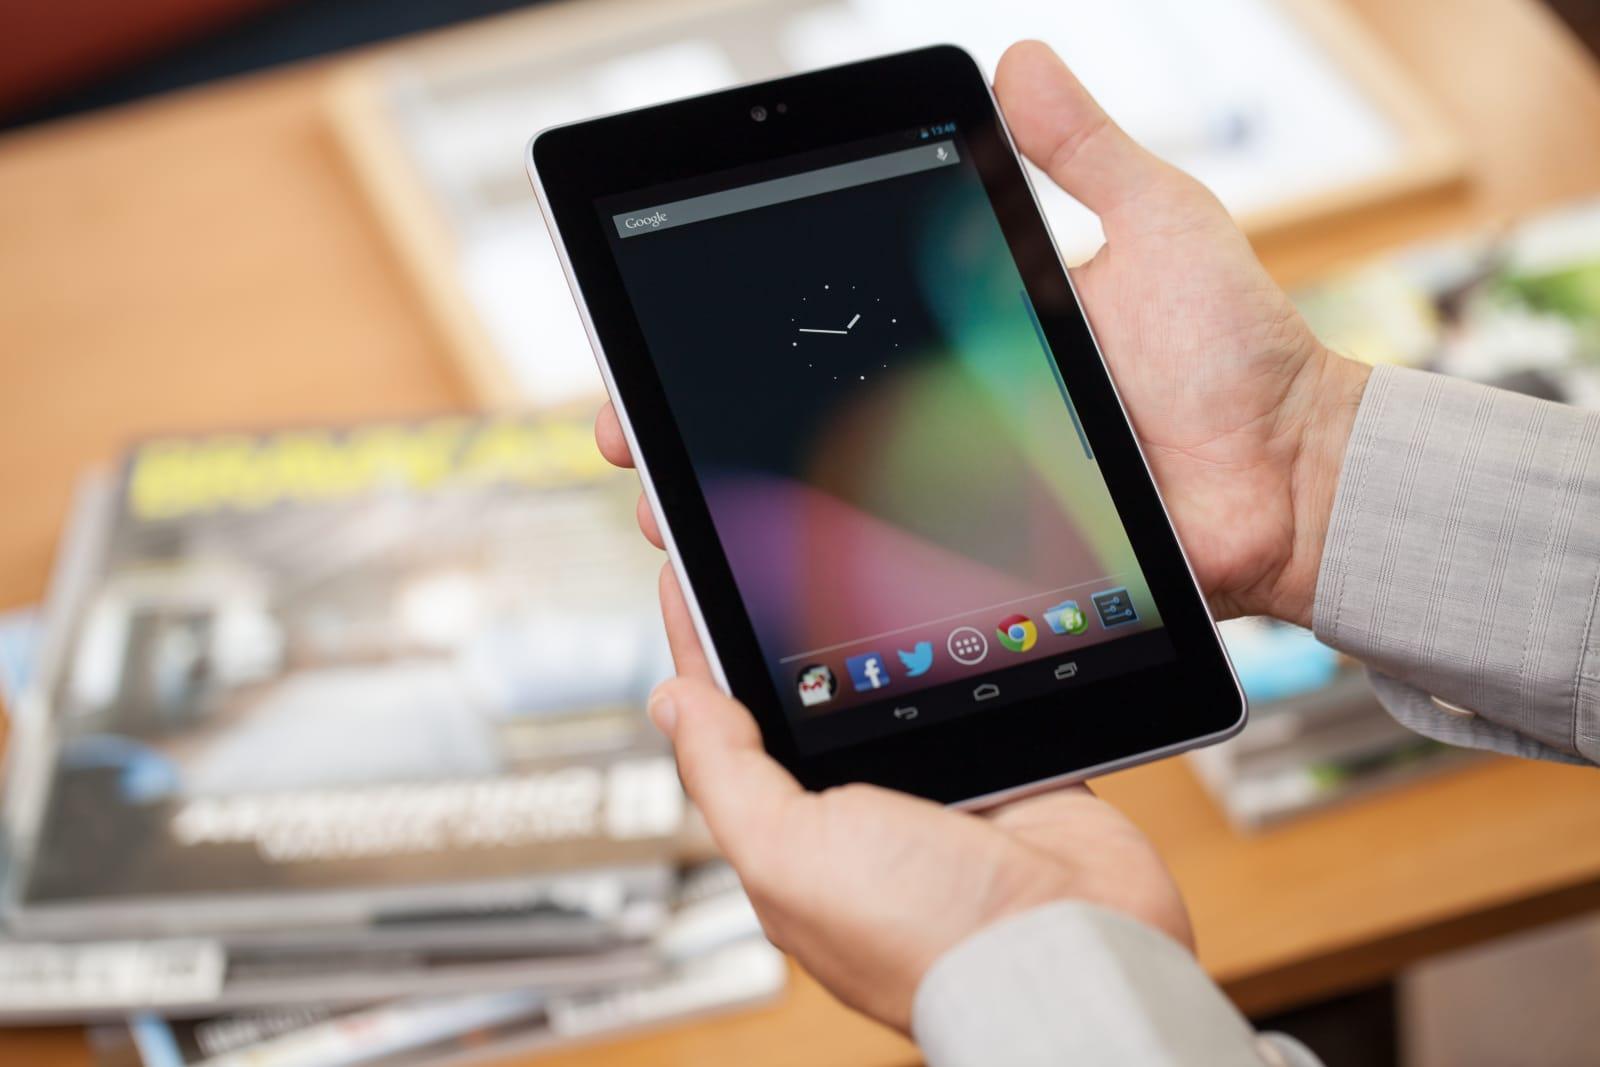 Man holding Google Nexus 7 digital tablet